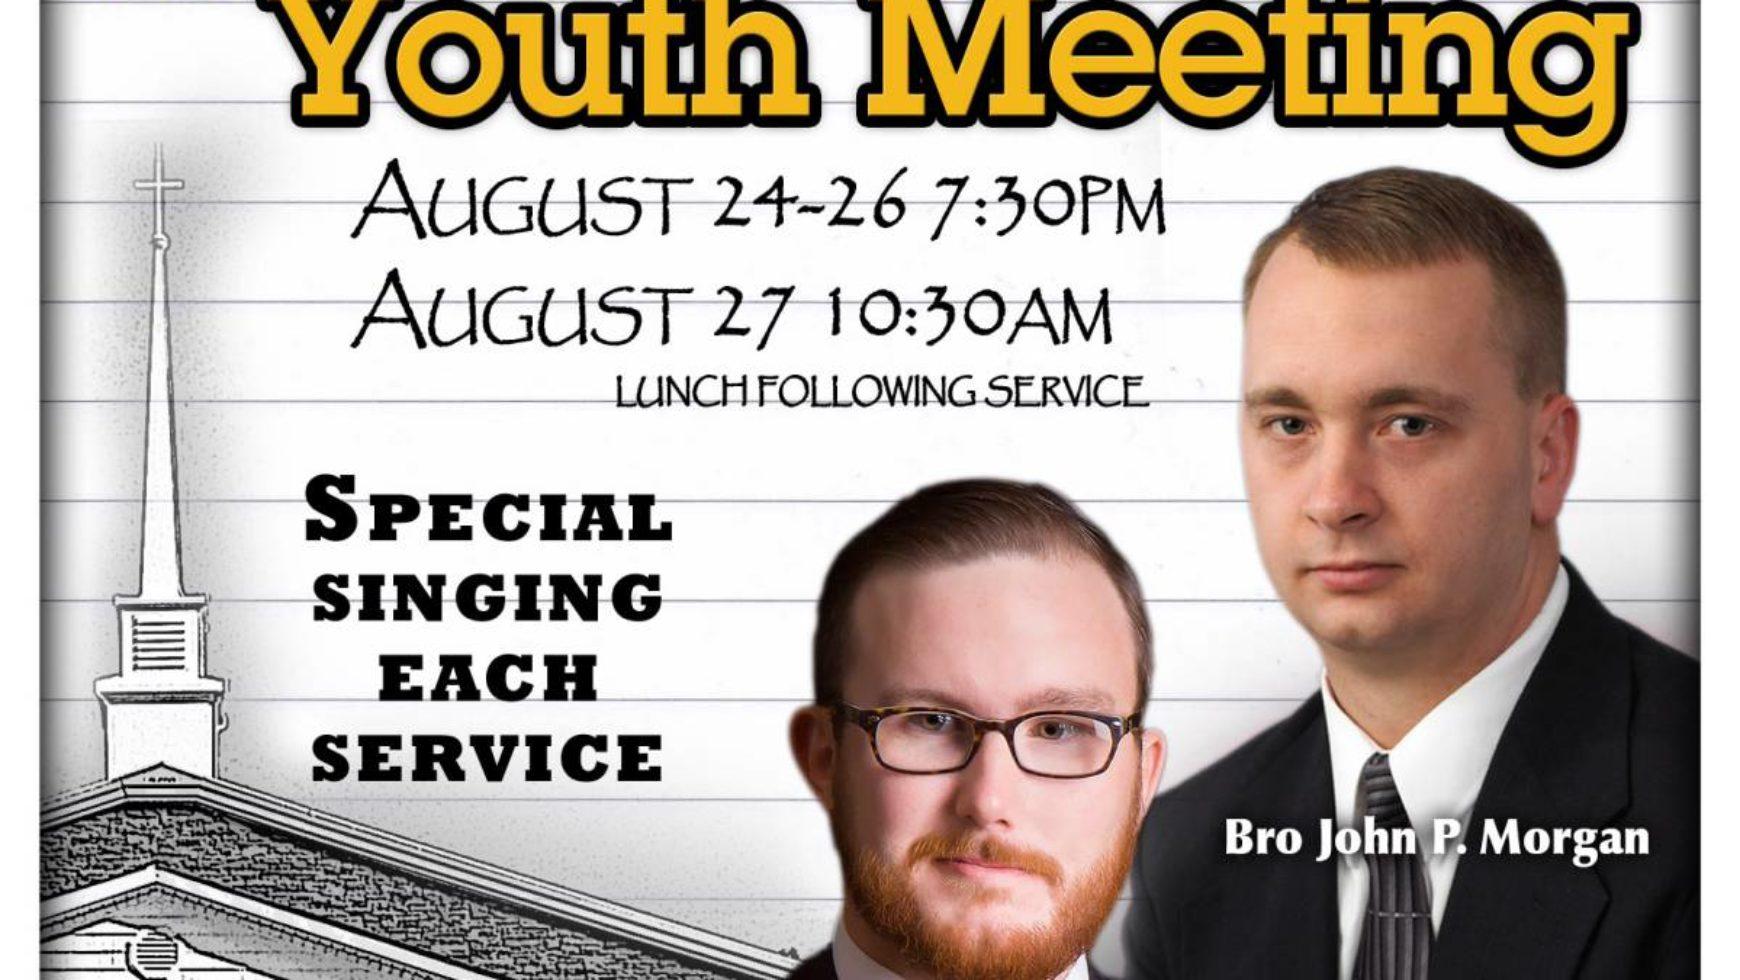 Area Meeting: Youth Meeting – White Graves Baptist Church – Ranger, Ga